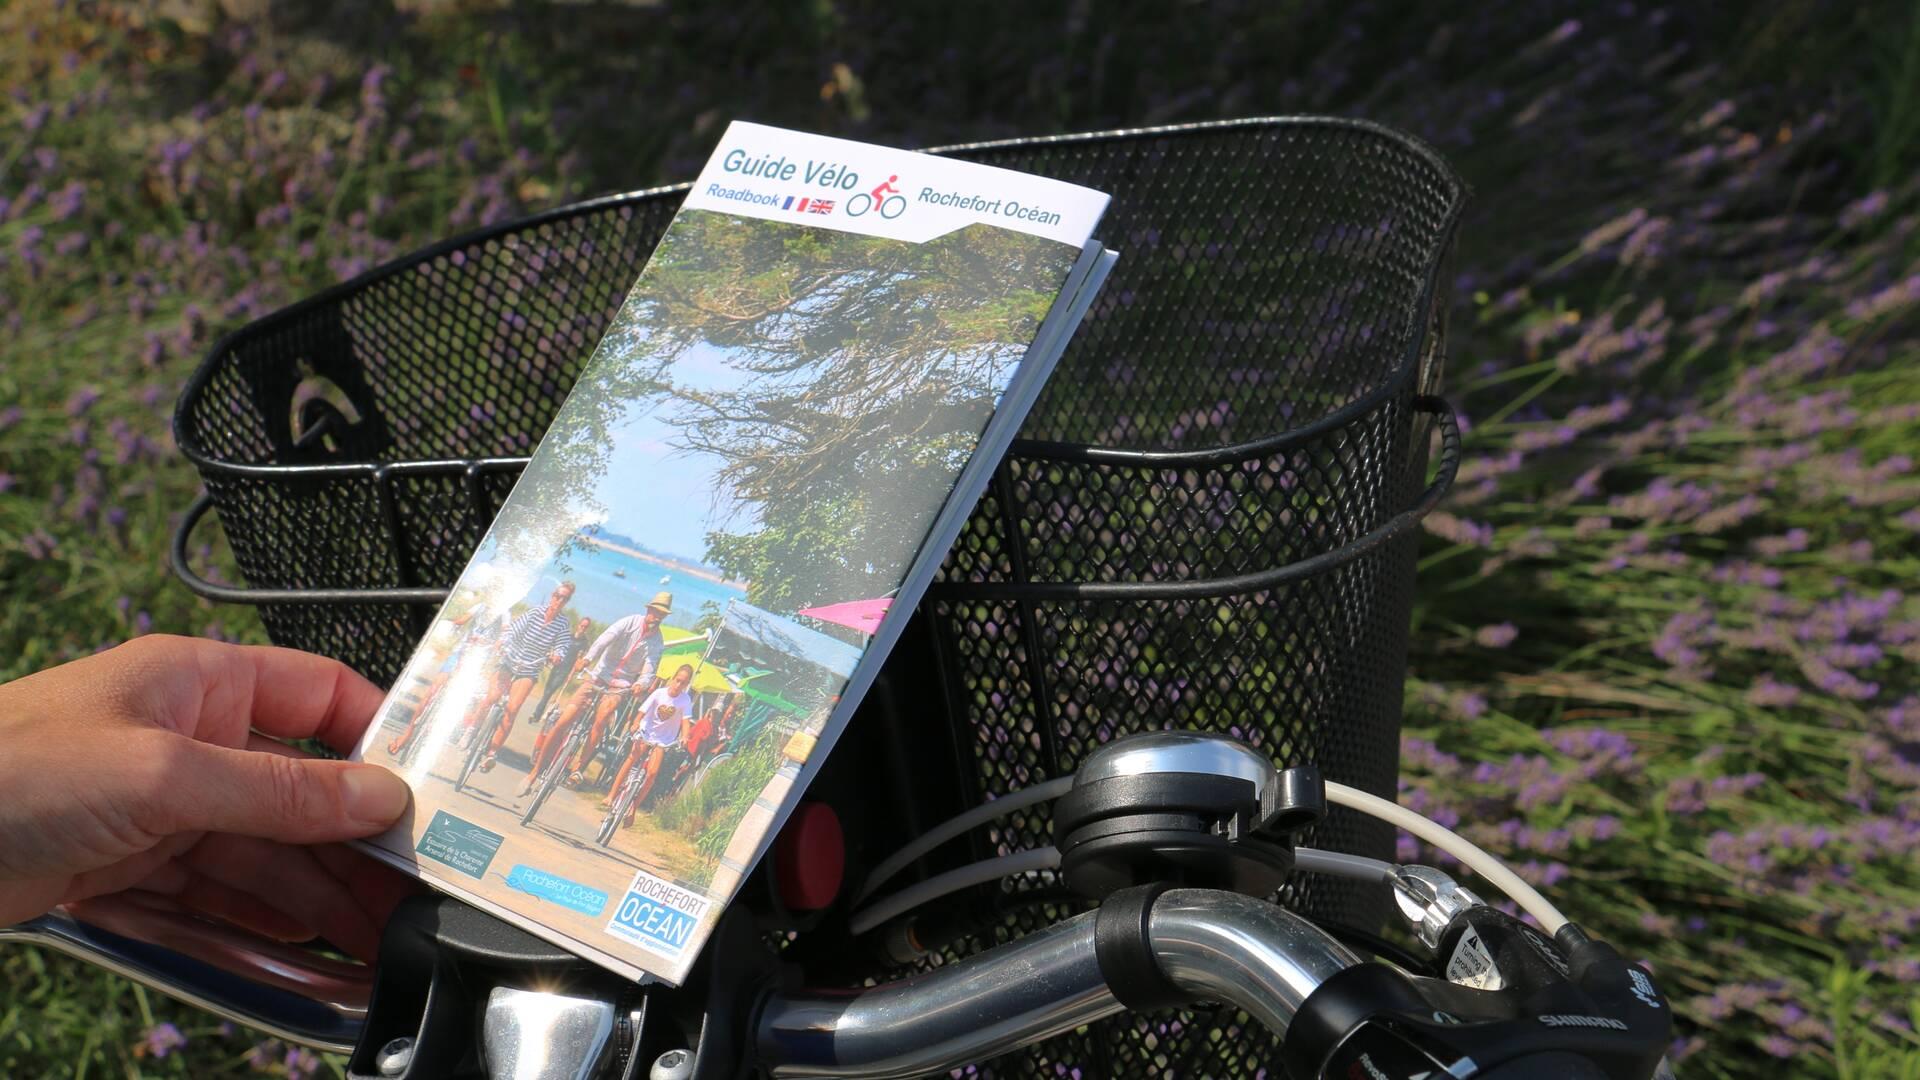 Guide vélo Rochefort Océan